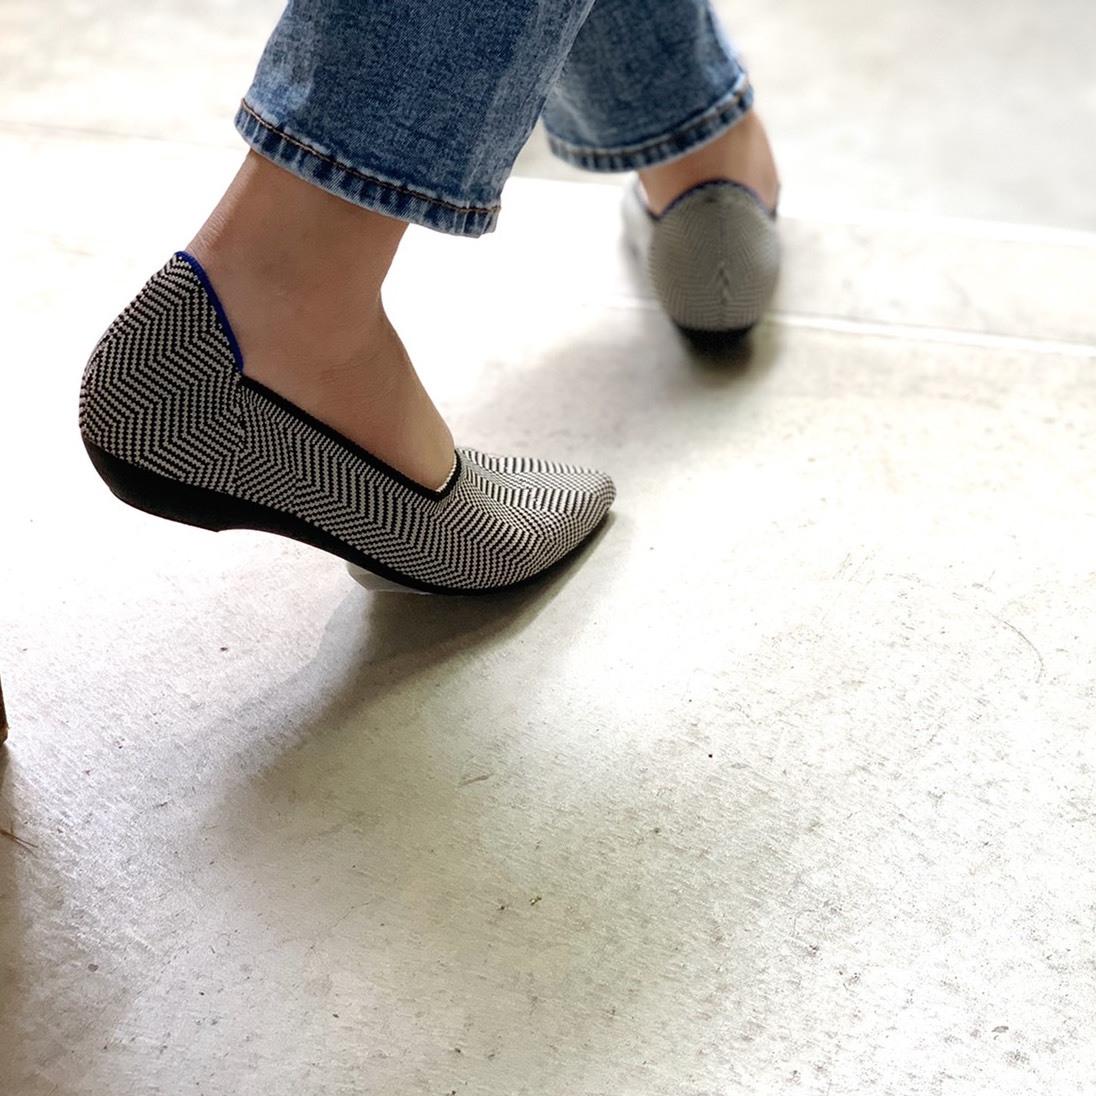 Knitting mold flat shoes|ニッティングモールドフラットシューズ #ot1123|【Ought=na】|madeinjapan|日本製